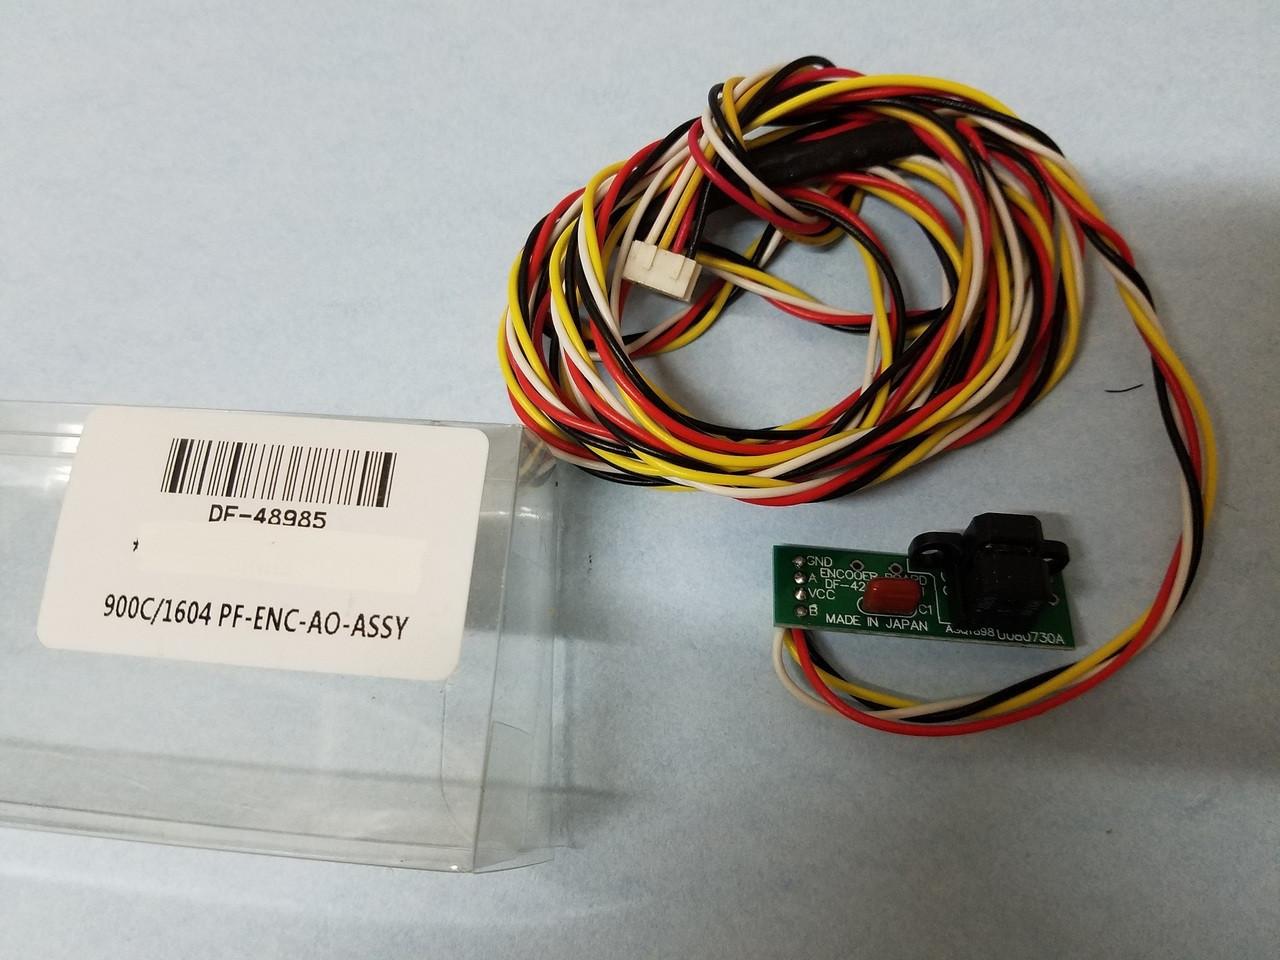 d1904c9b46d Sensor PF encoder (16D) board for Mutoh VJ1204 1604 1618 1628 RJ900 ...